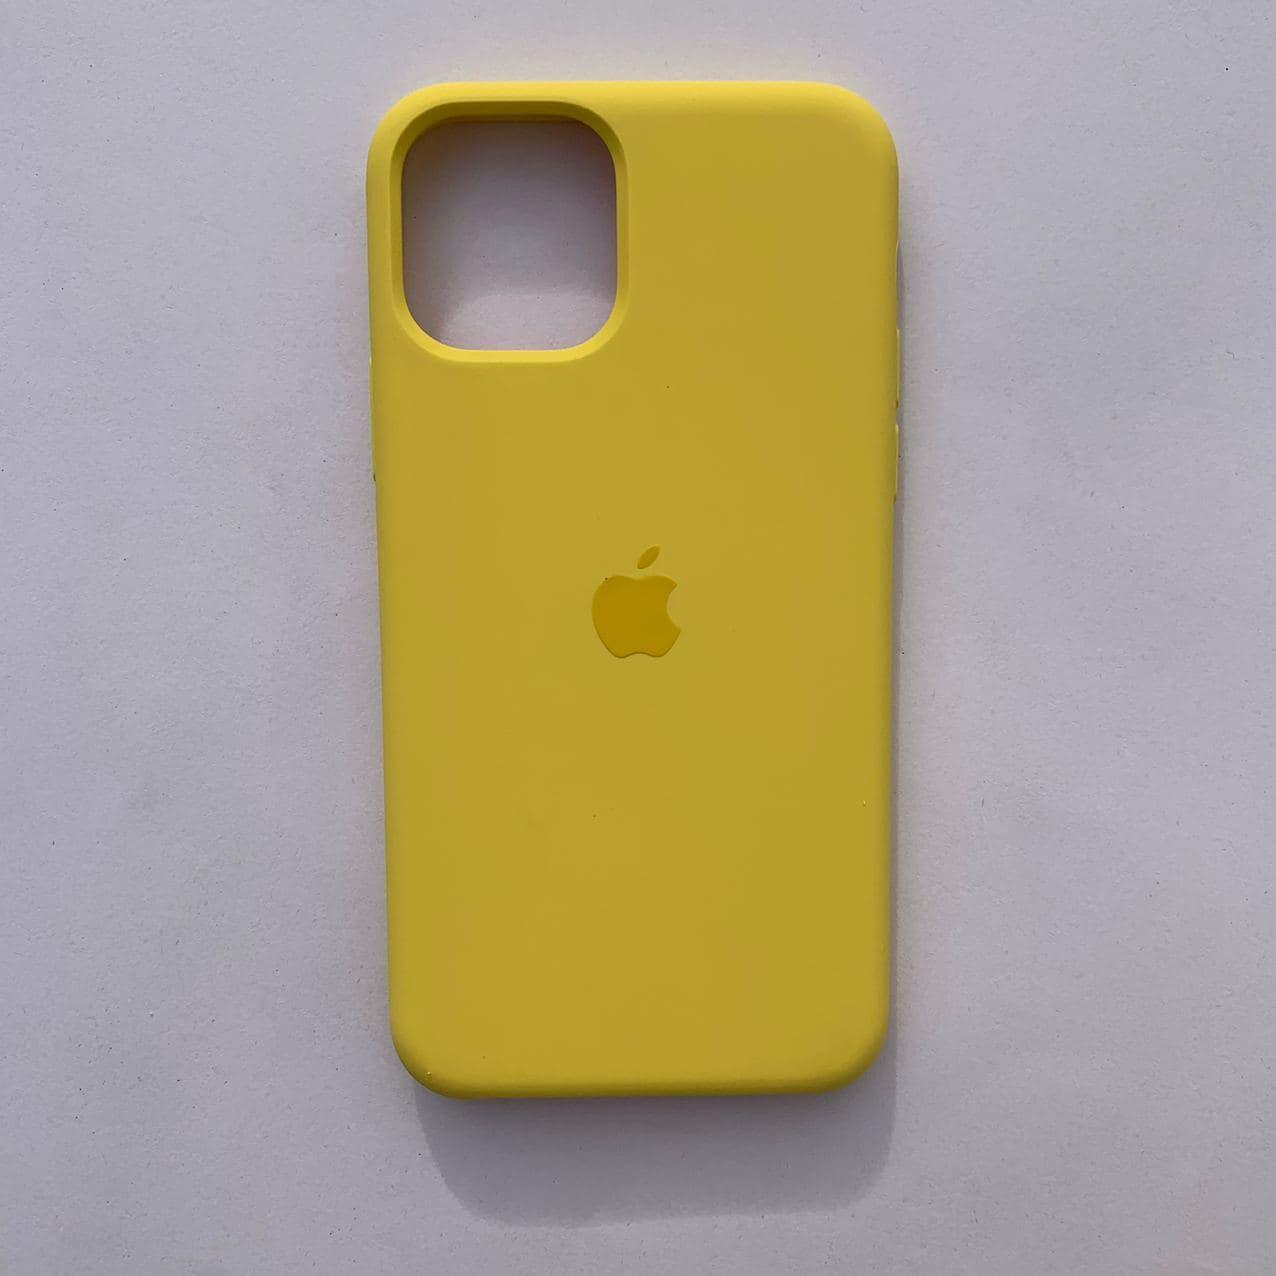 Накладка Silicone Case для Apple iPhone 11 Pro Canary Yellow